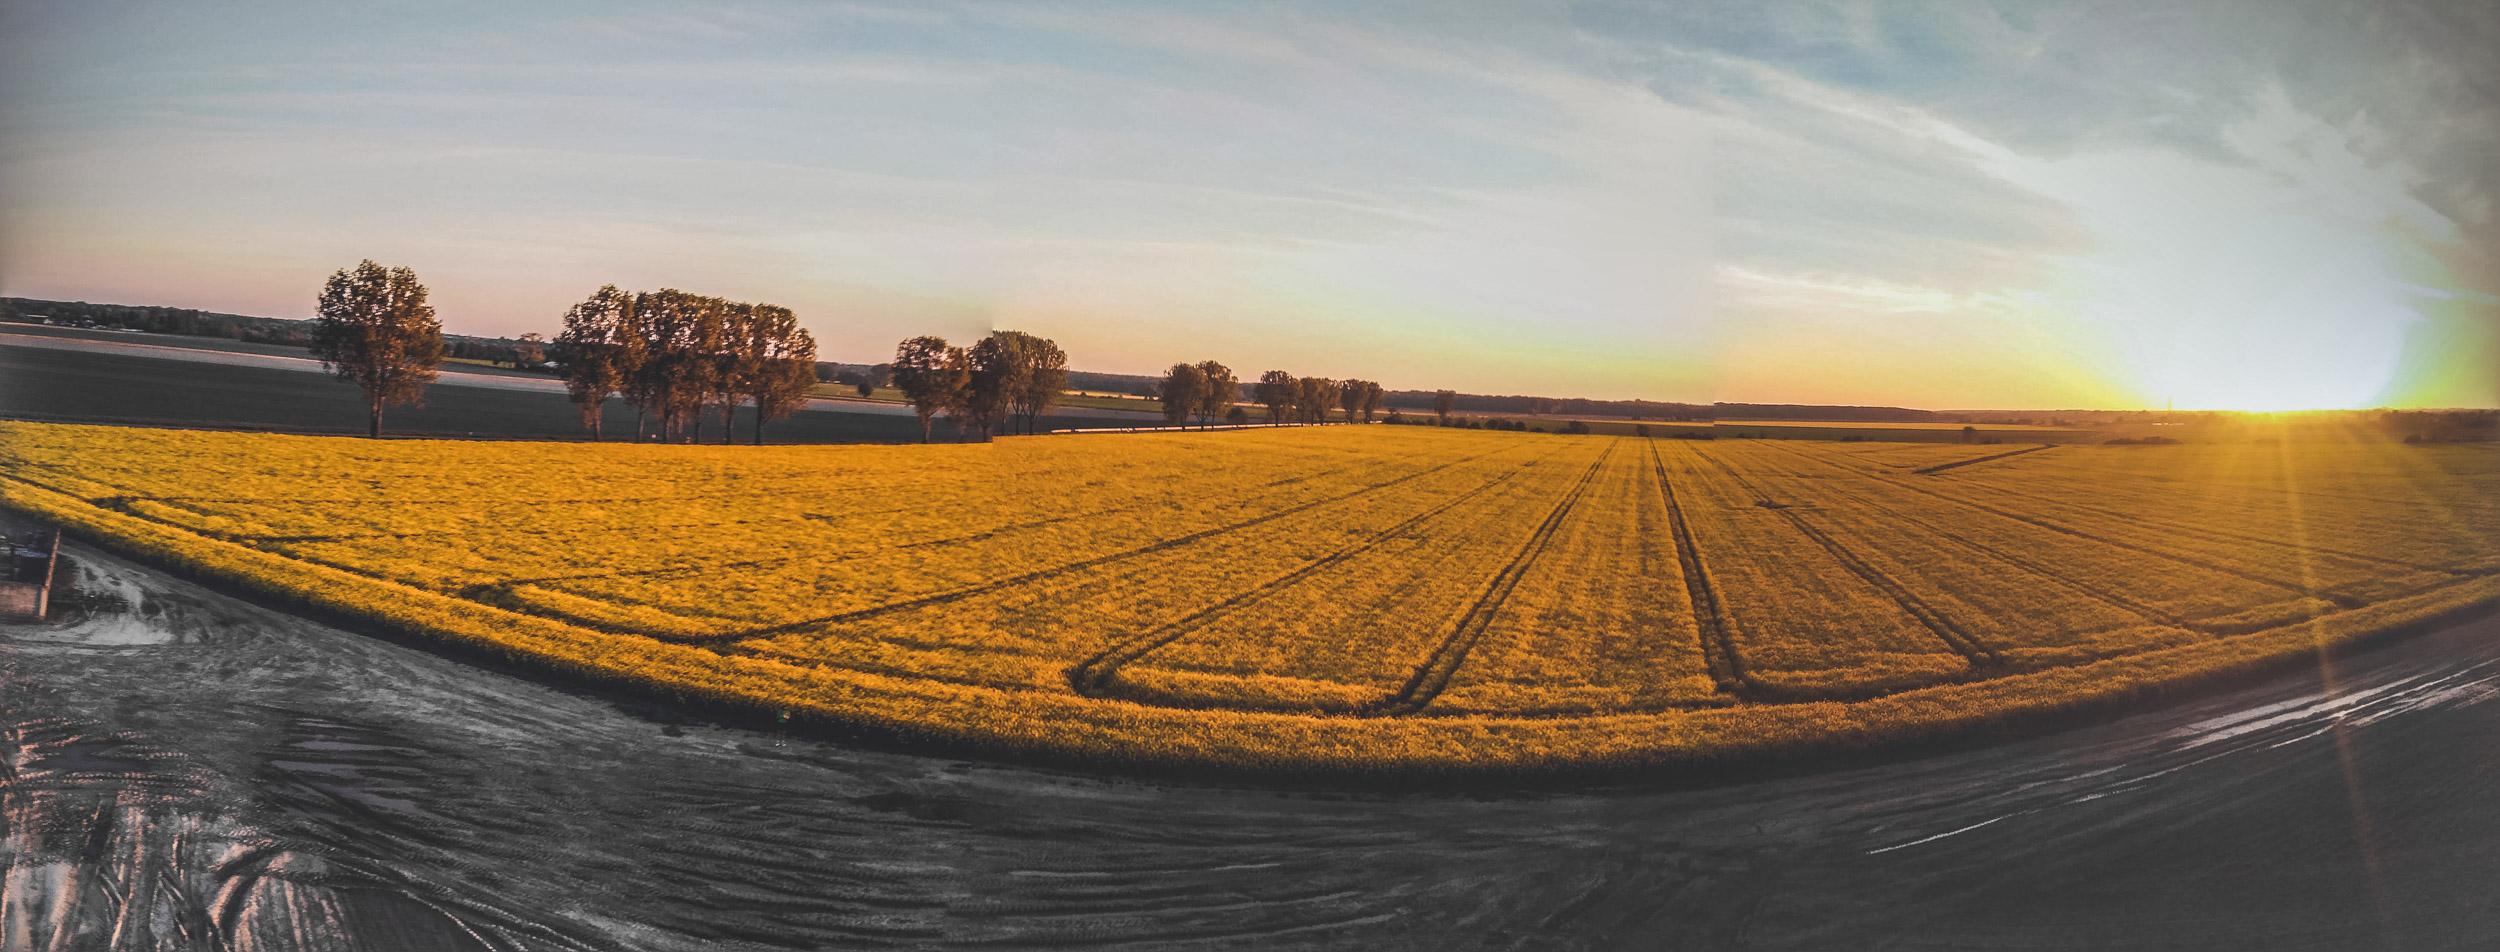 dobby drone panorama